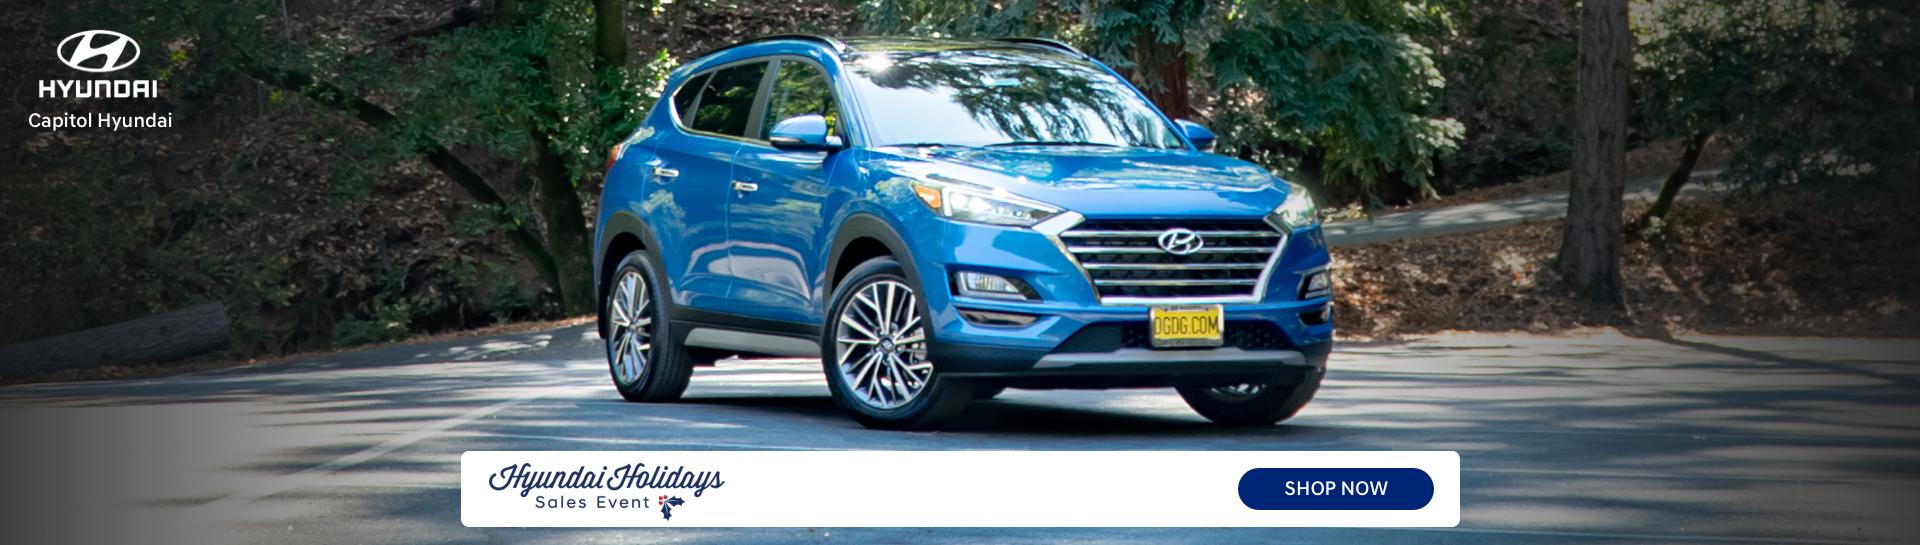 Capitol Hyundai Holidays Sales Event